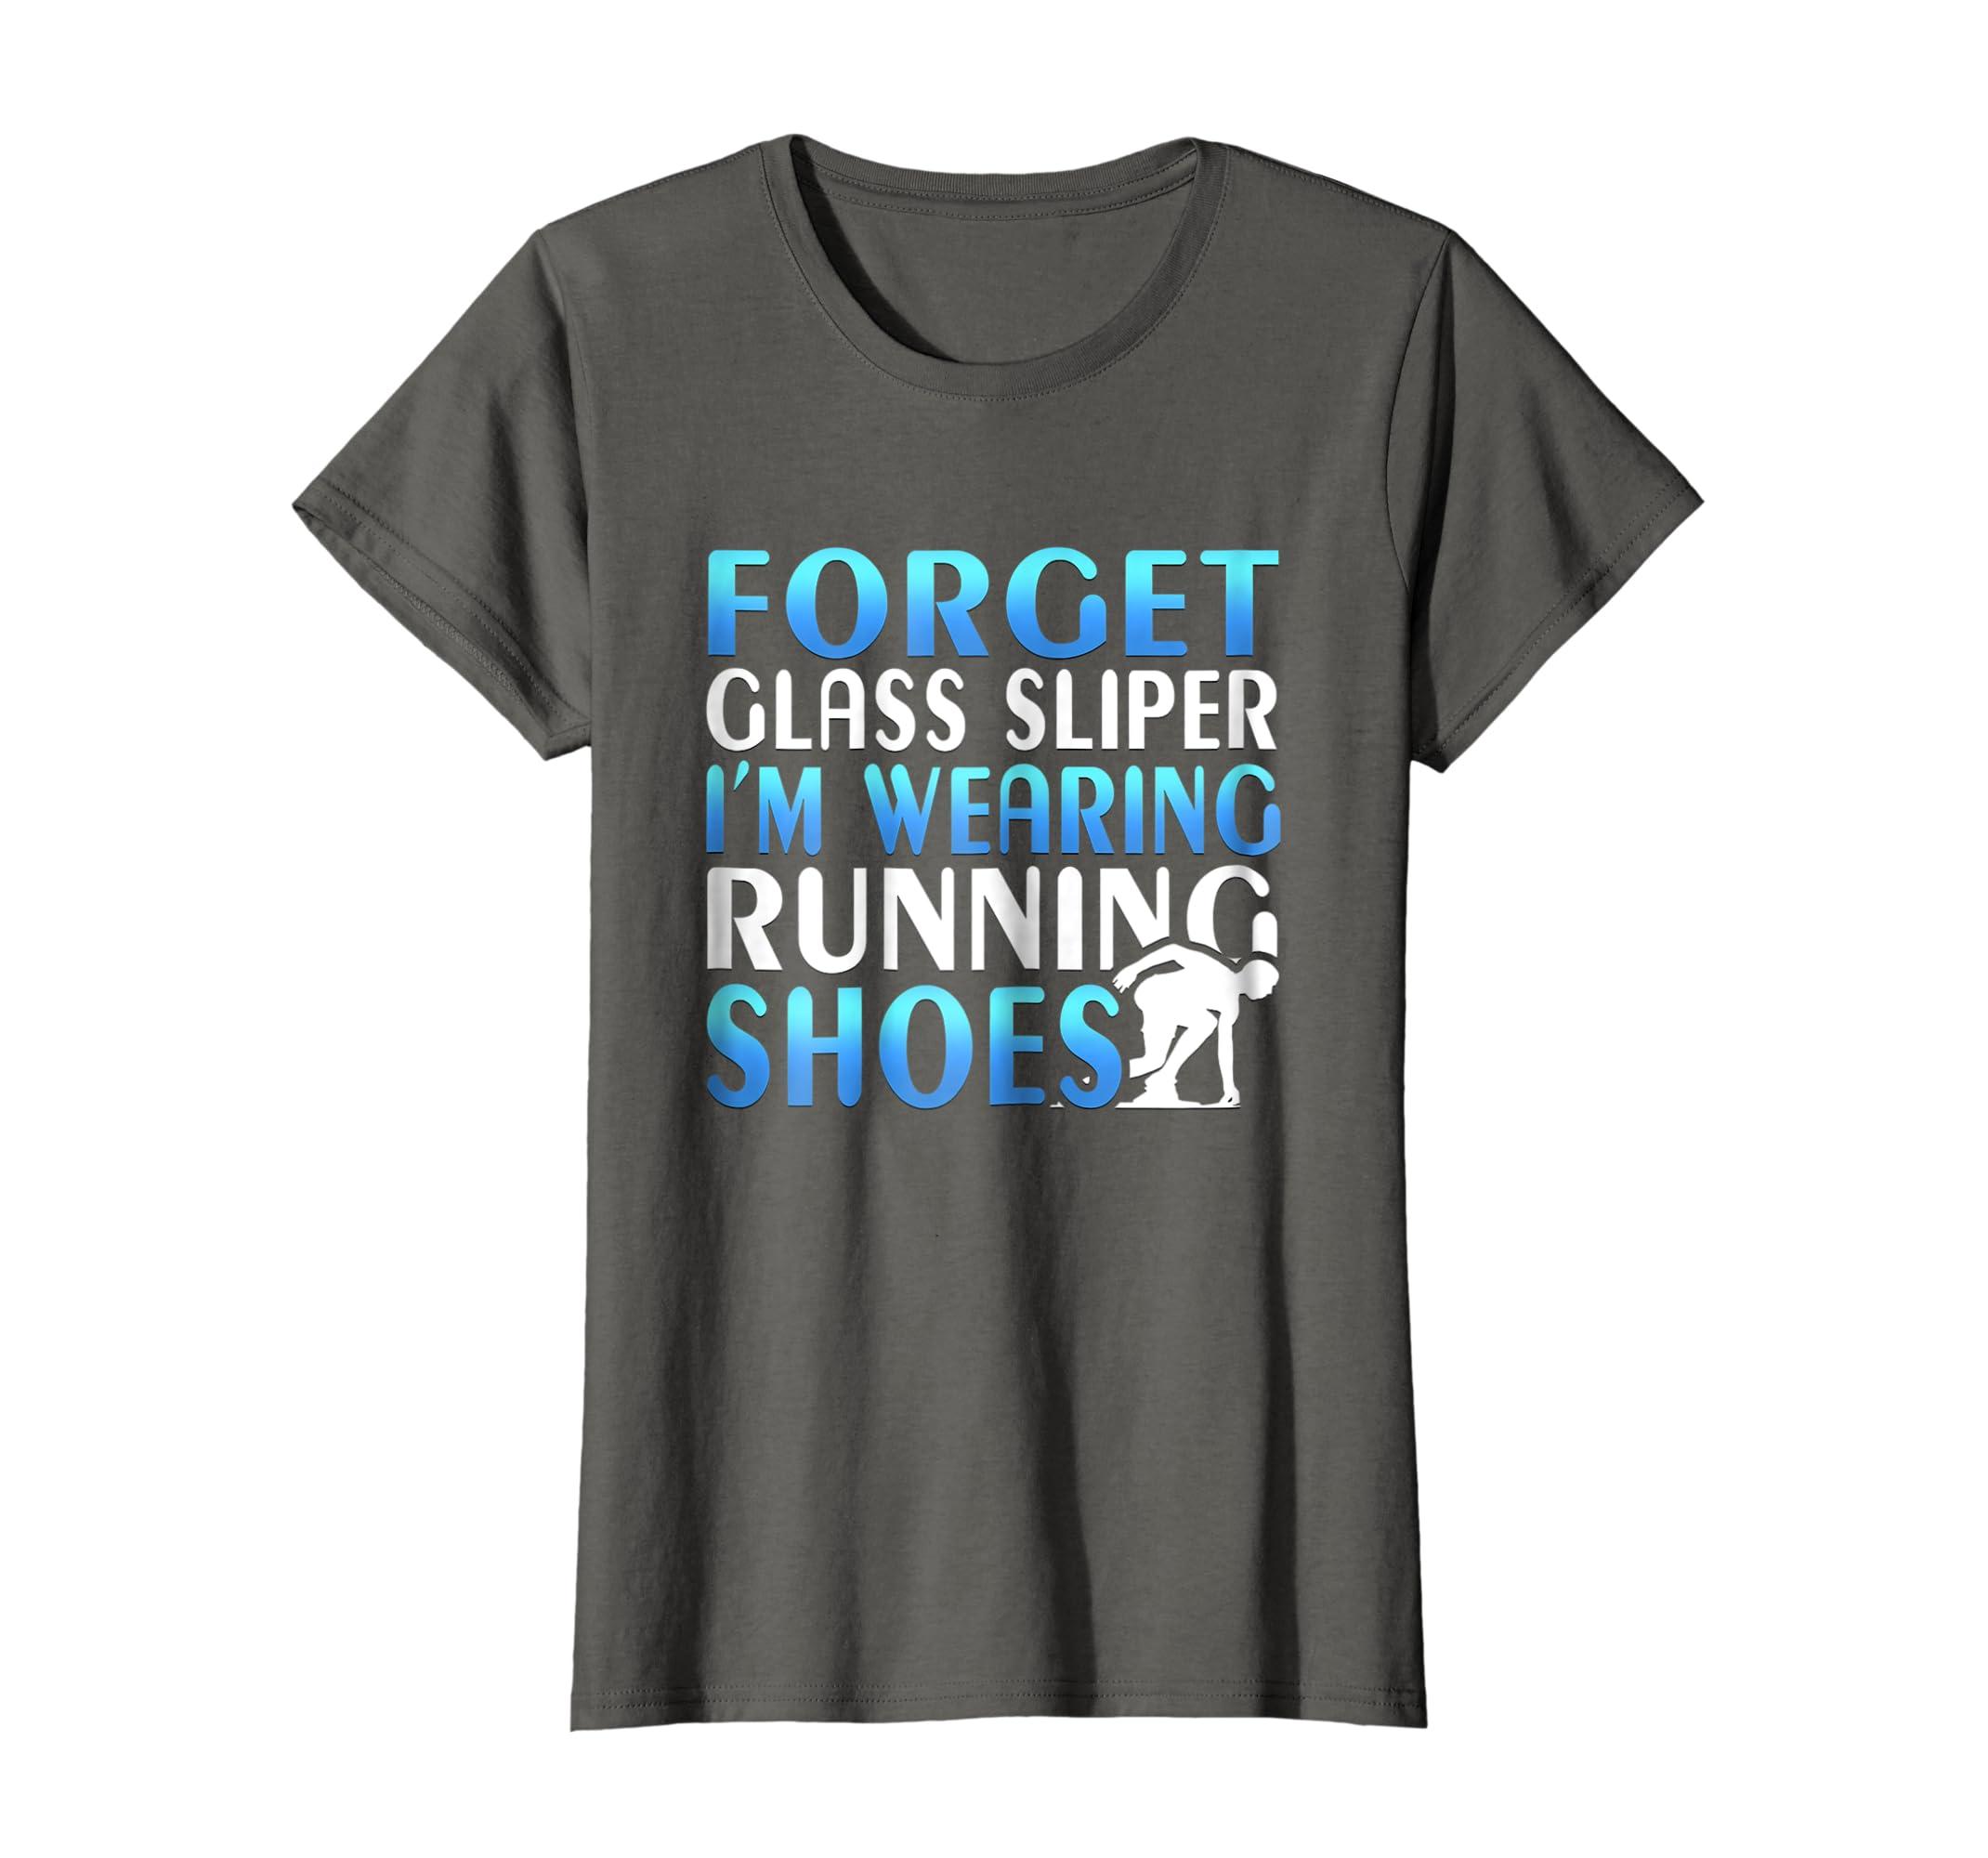 b3c598165988 Amazon.com  Forget Glass Slipper I m Wearing Running Shoes Funny T-Shirt   Clothing